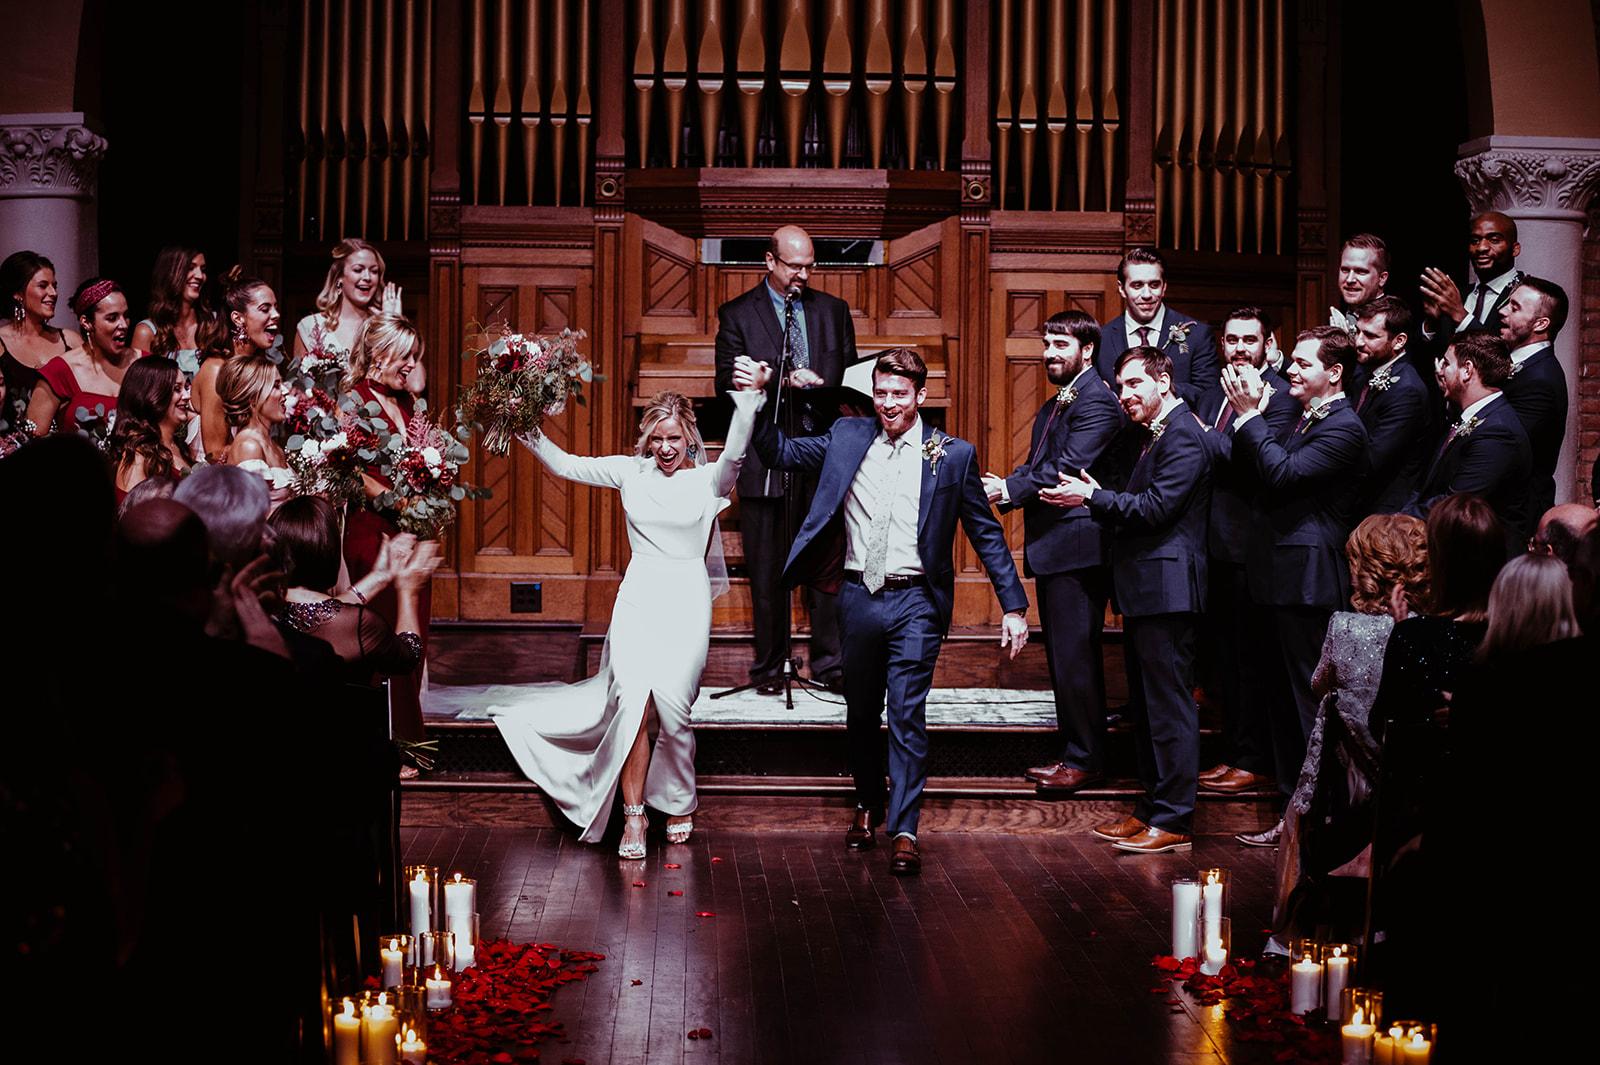 photo courtesy of  Swanky Fine Art Weddings